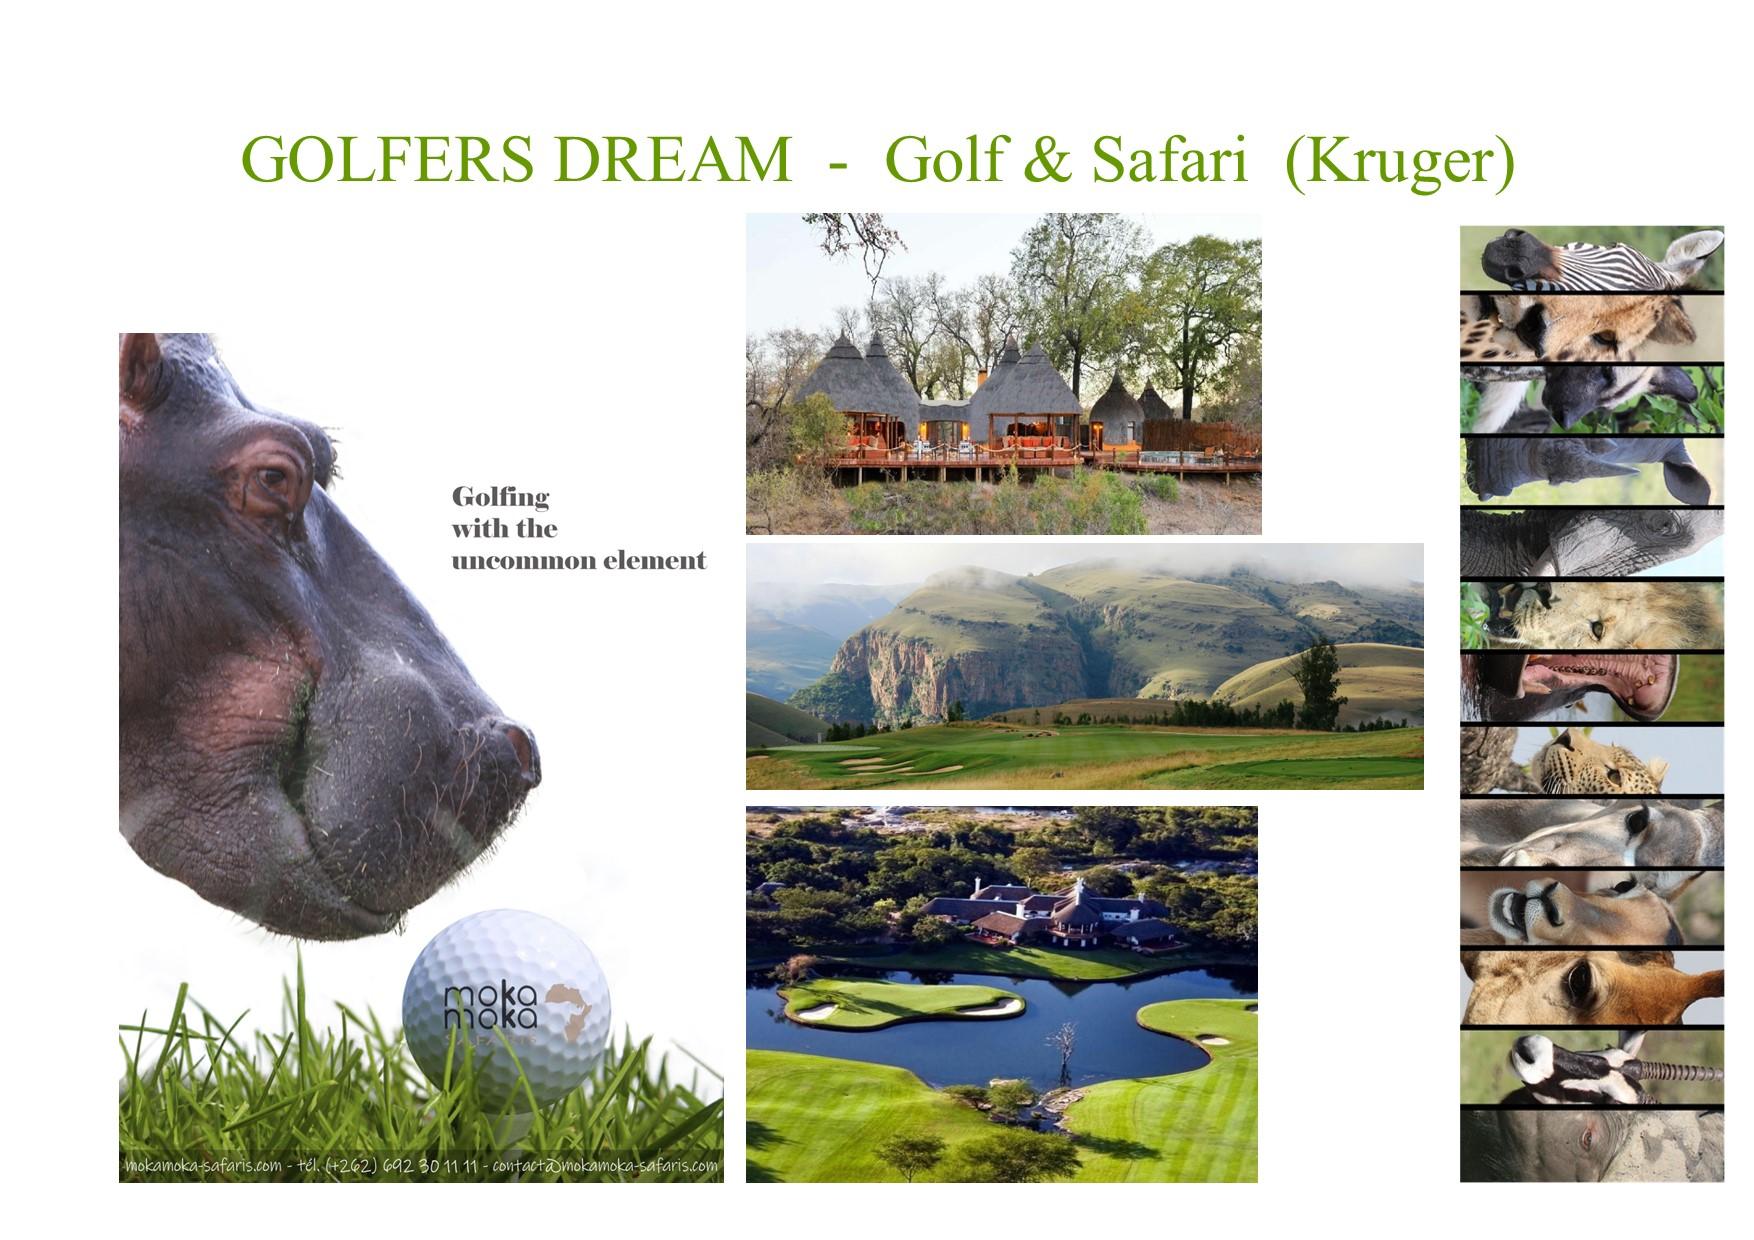 Kruger Golfsafari